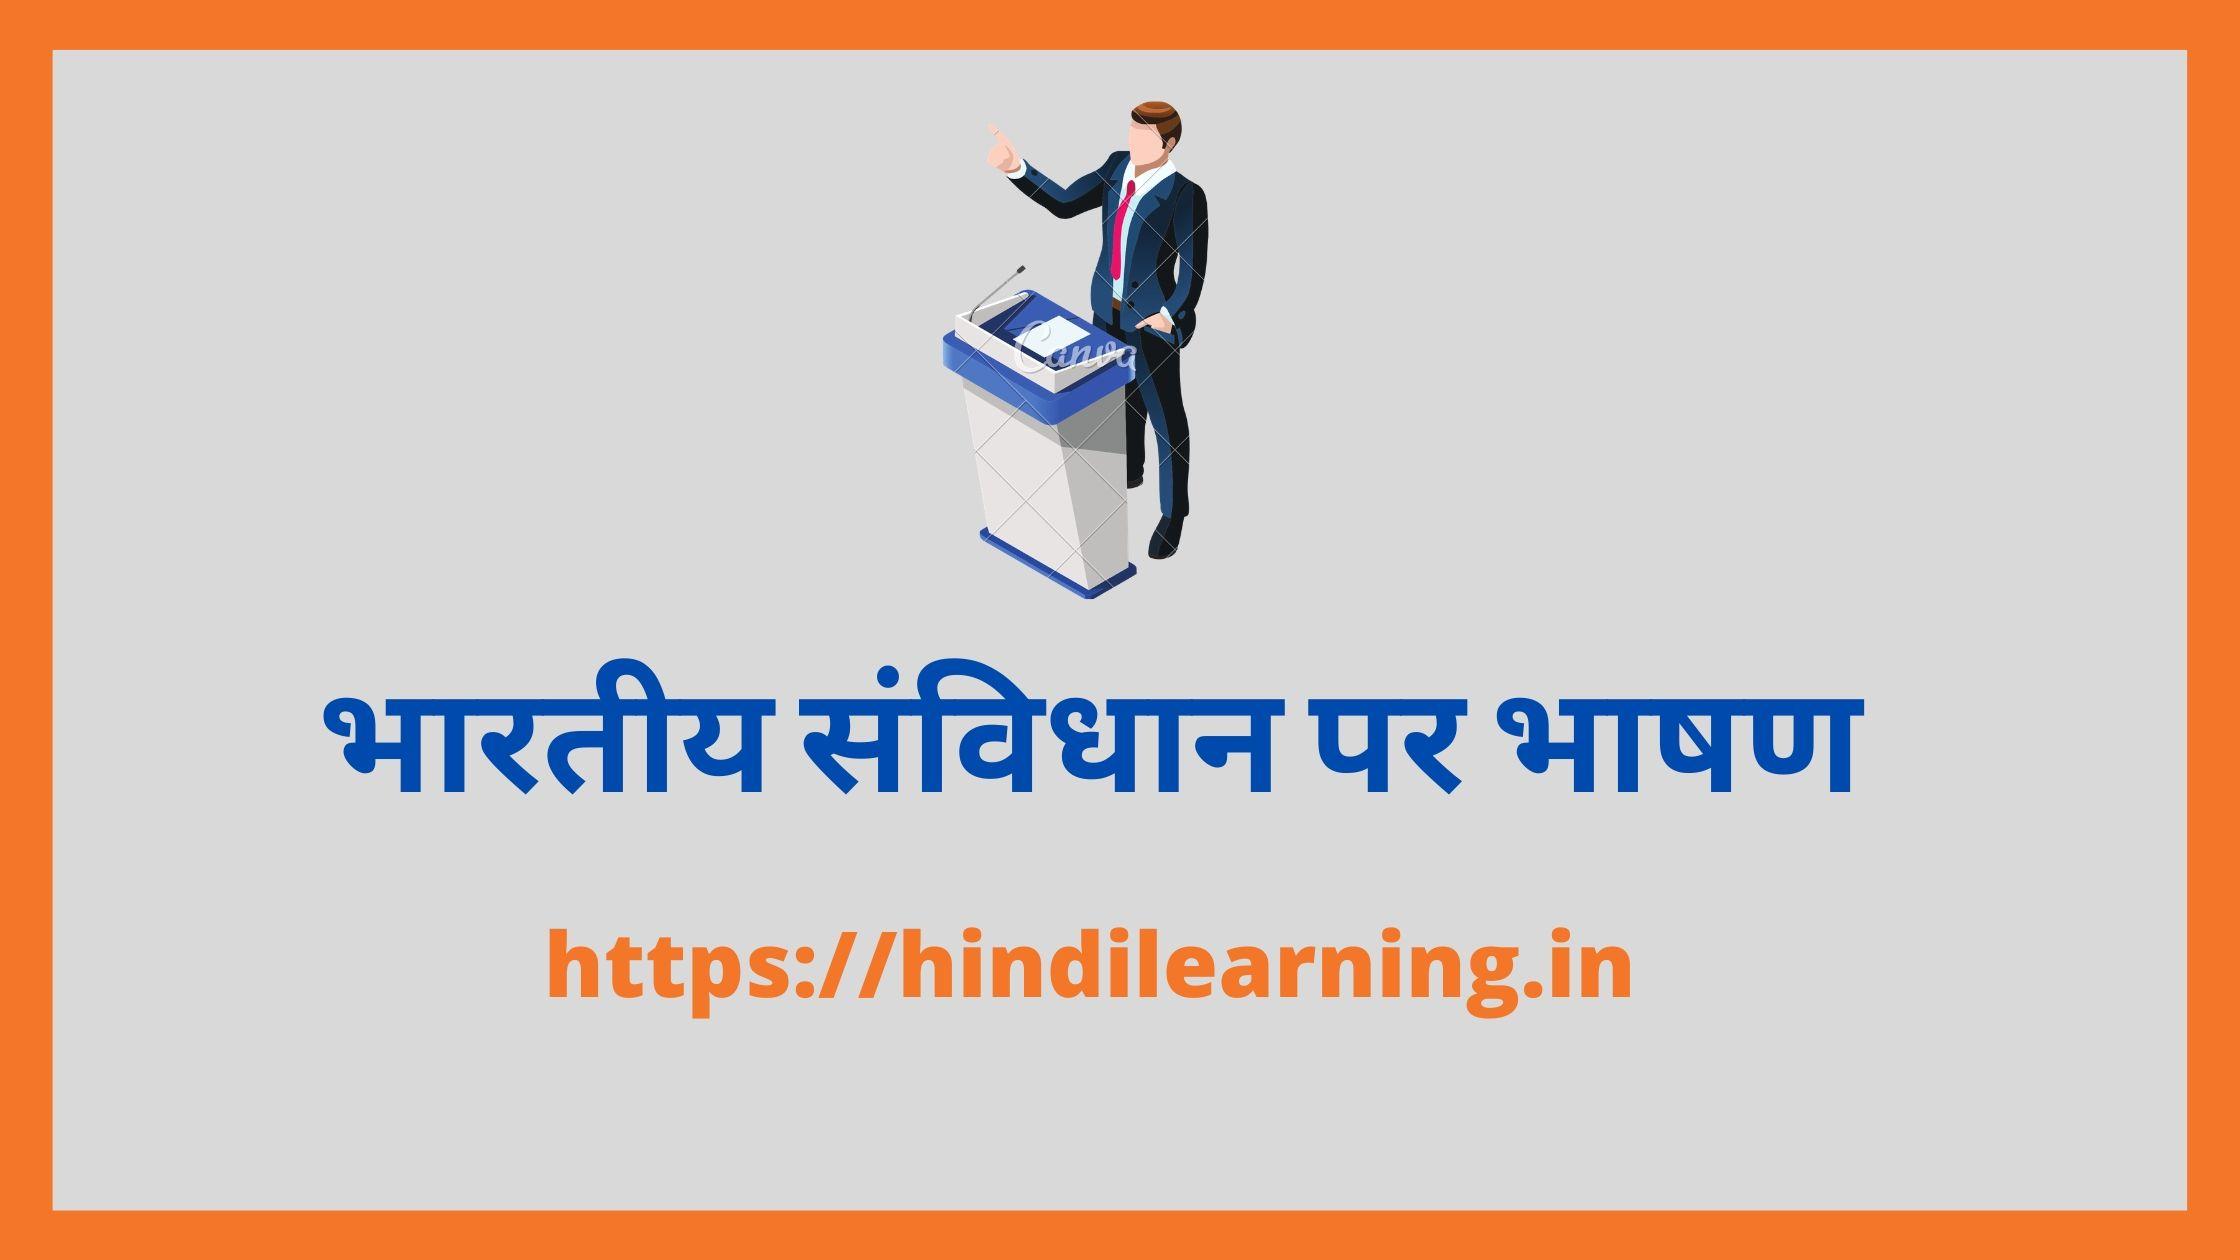 भारतीय संविधान पर भाषण - Speech on Constitution of India in Hindi